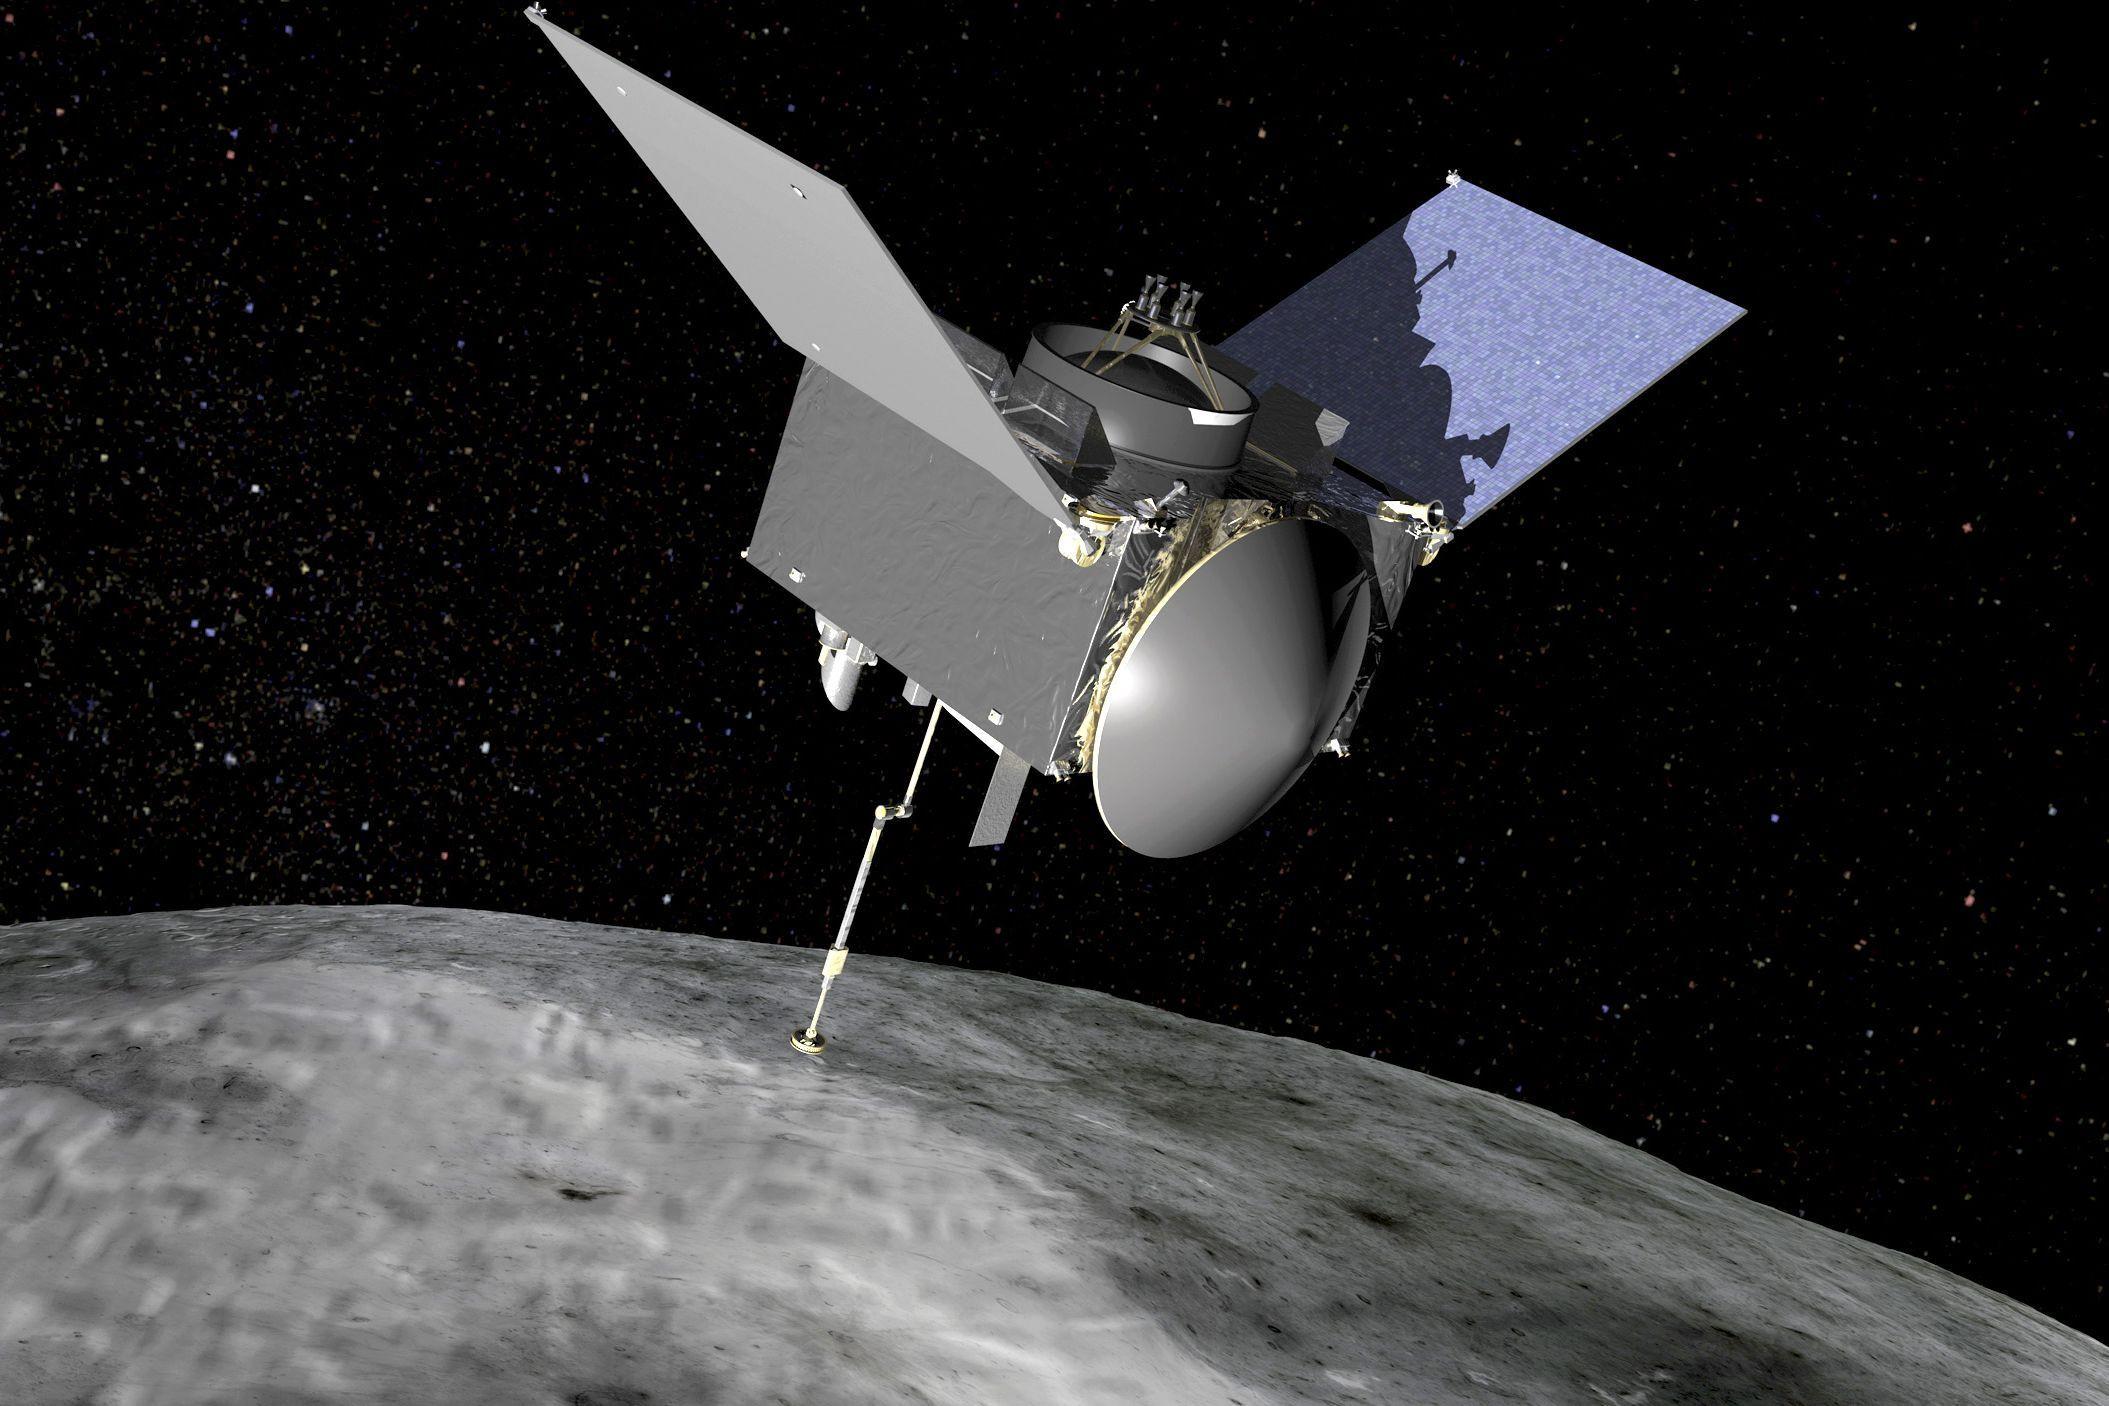 Sonda espacial chega perto de asteroide para recolher amostra